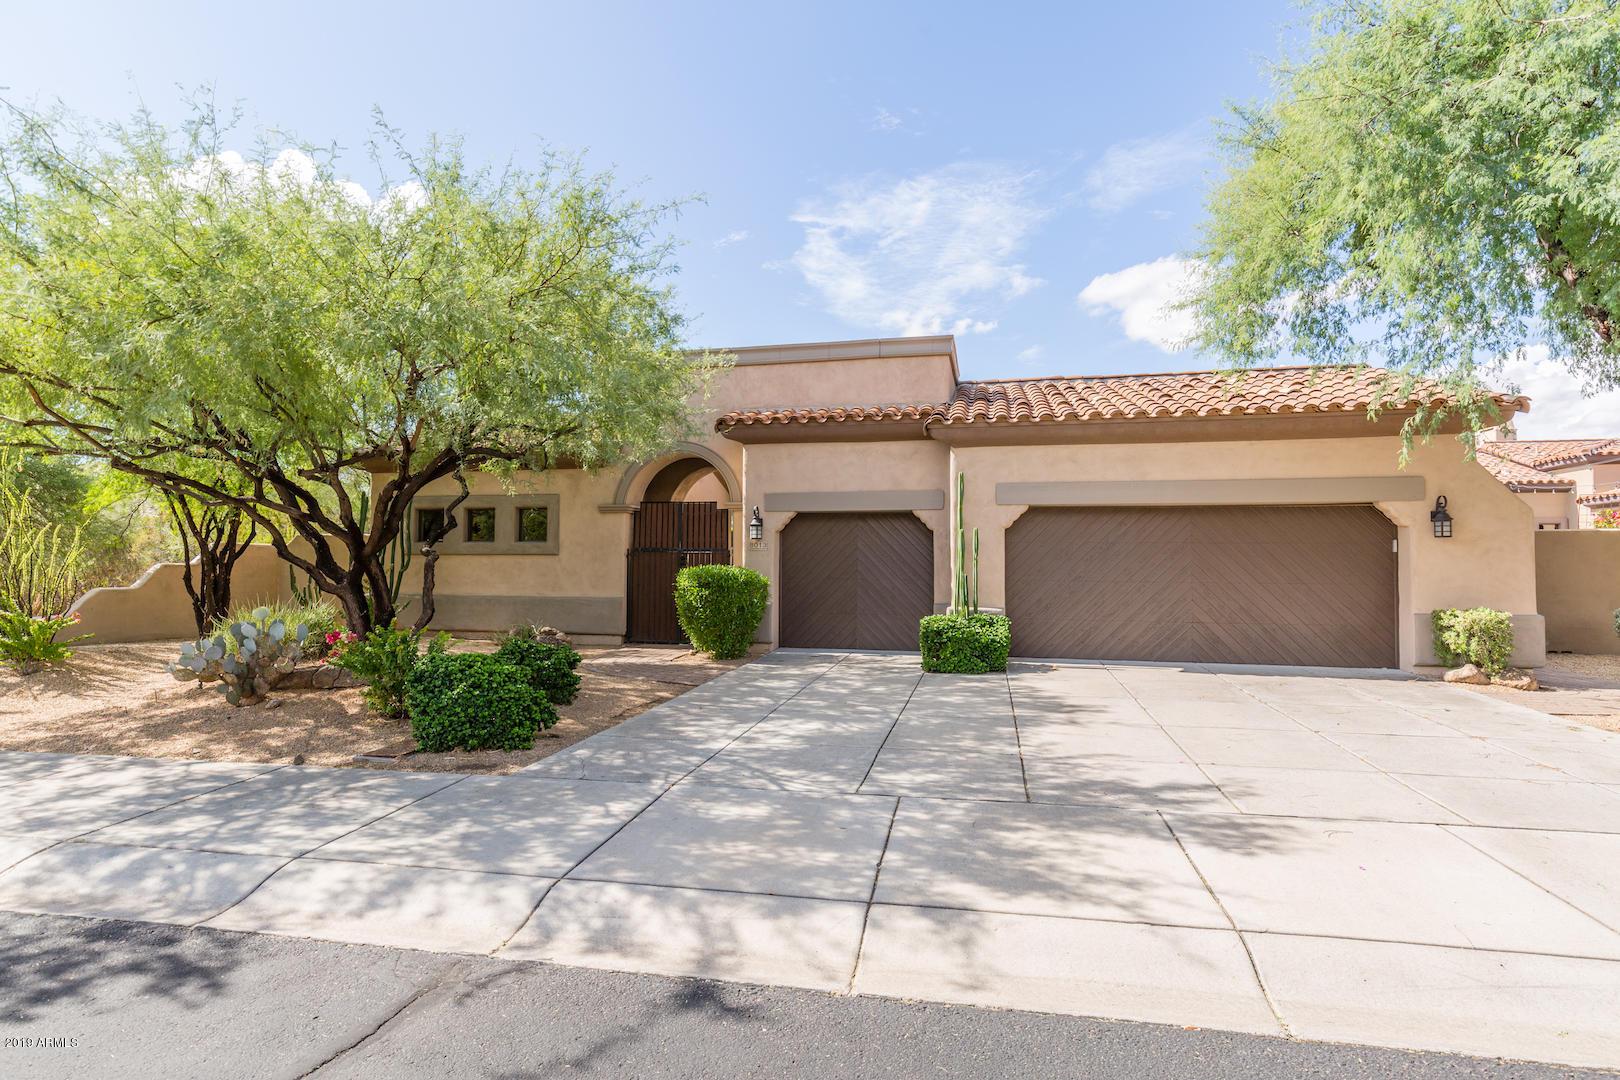 Photo of 8013 E WINGSPAN Way, Scottsdale, AZ 85255